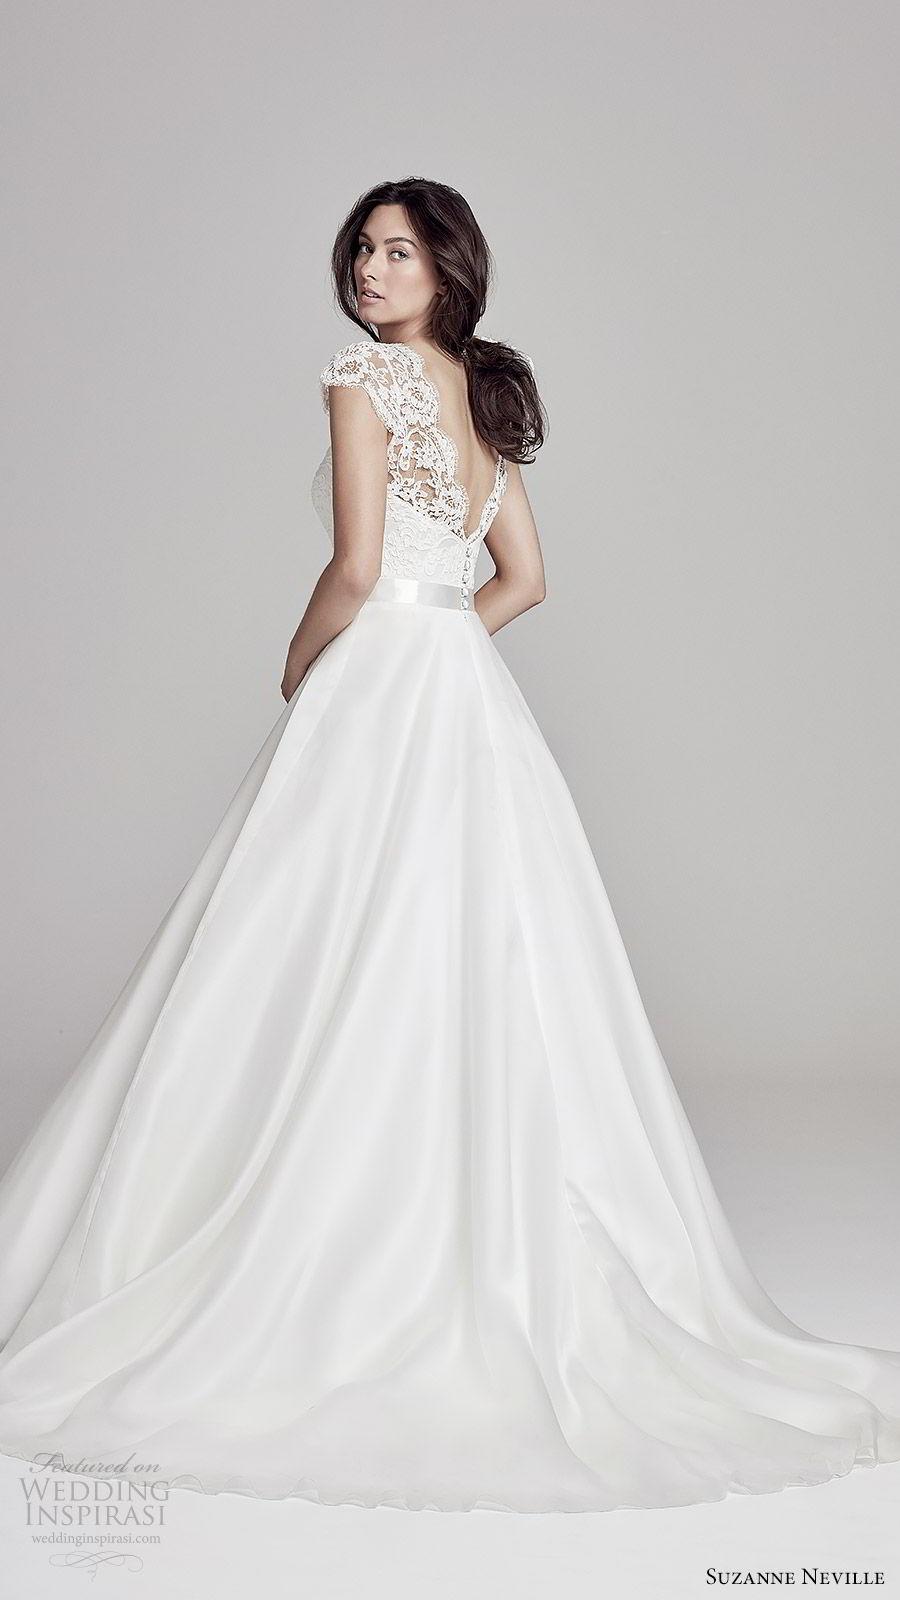 suzanne neville bridal 2019 illusion cap sleeves sheer v neck sweetheart a line wedding dress (alicia) v back chapel train romantic elegant bv